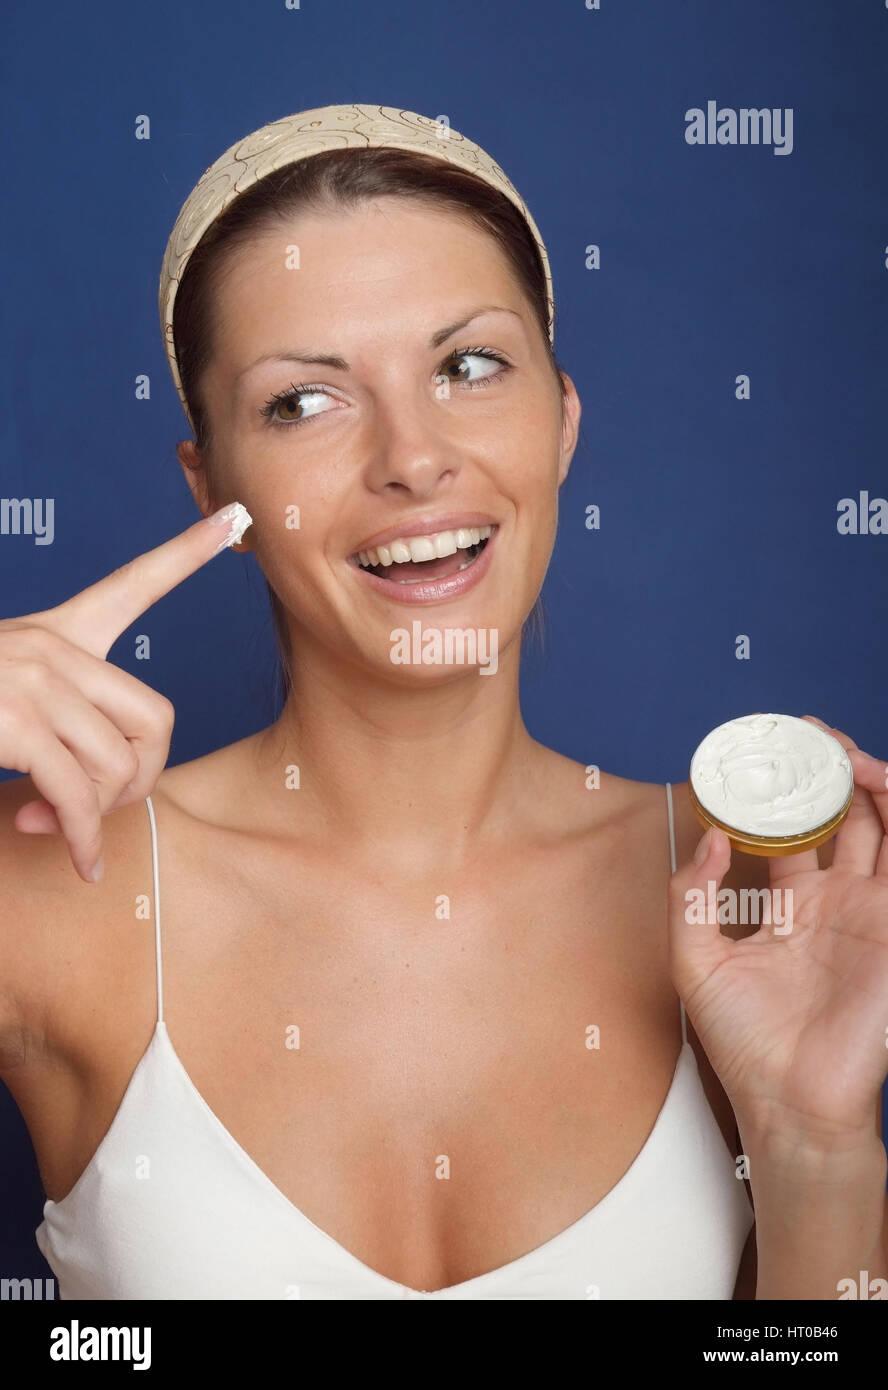 Frau verwendet Gesichtscreme - woman using face cream - Stock Image